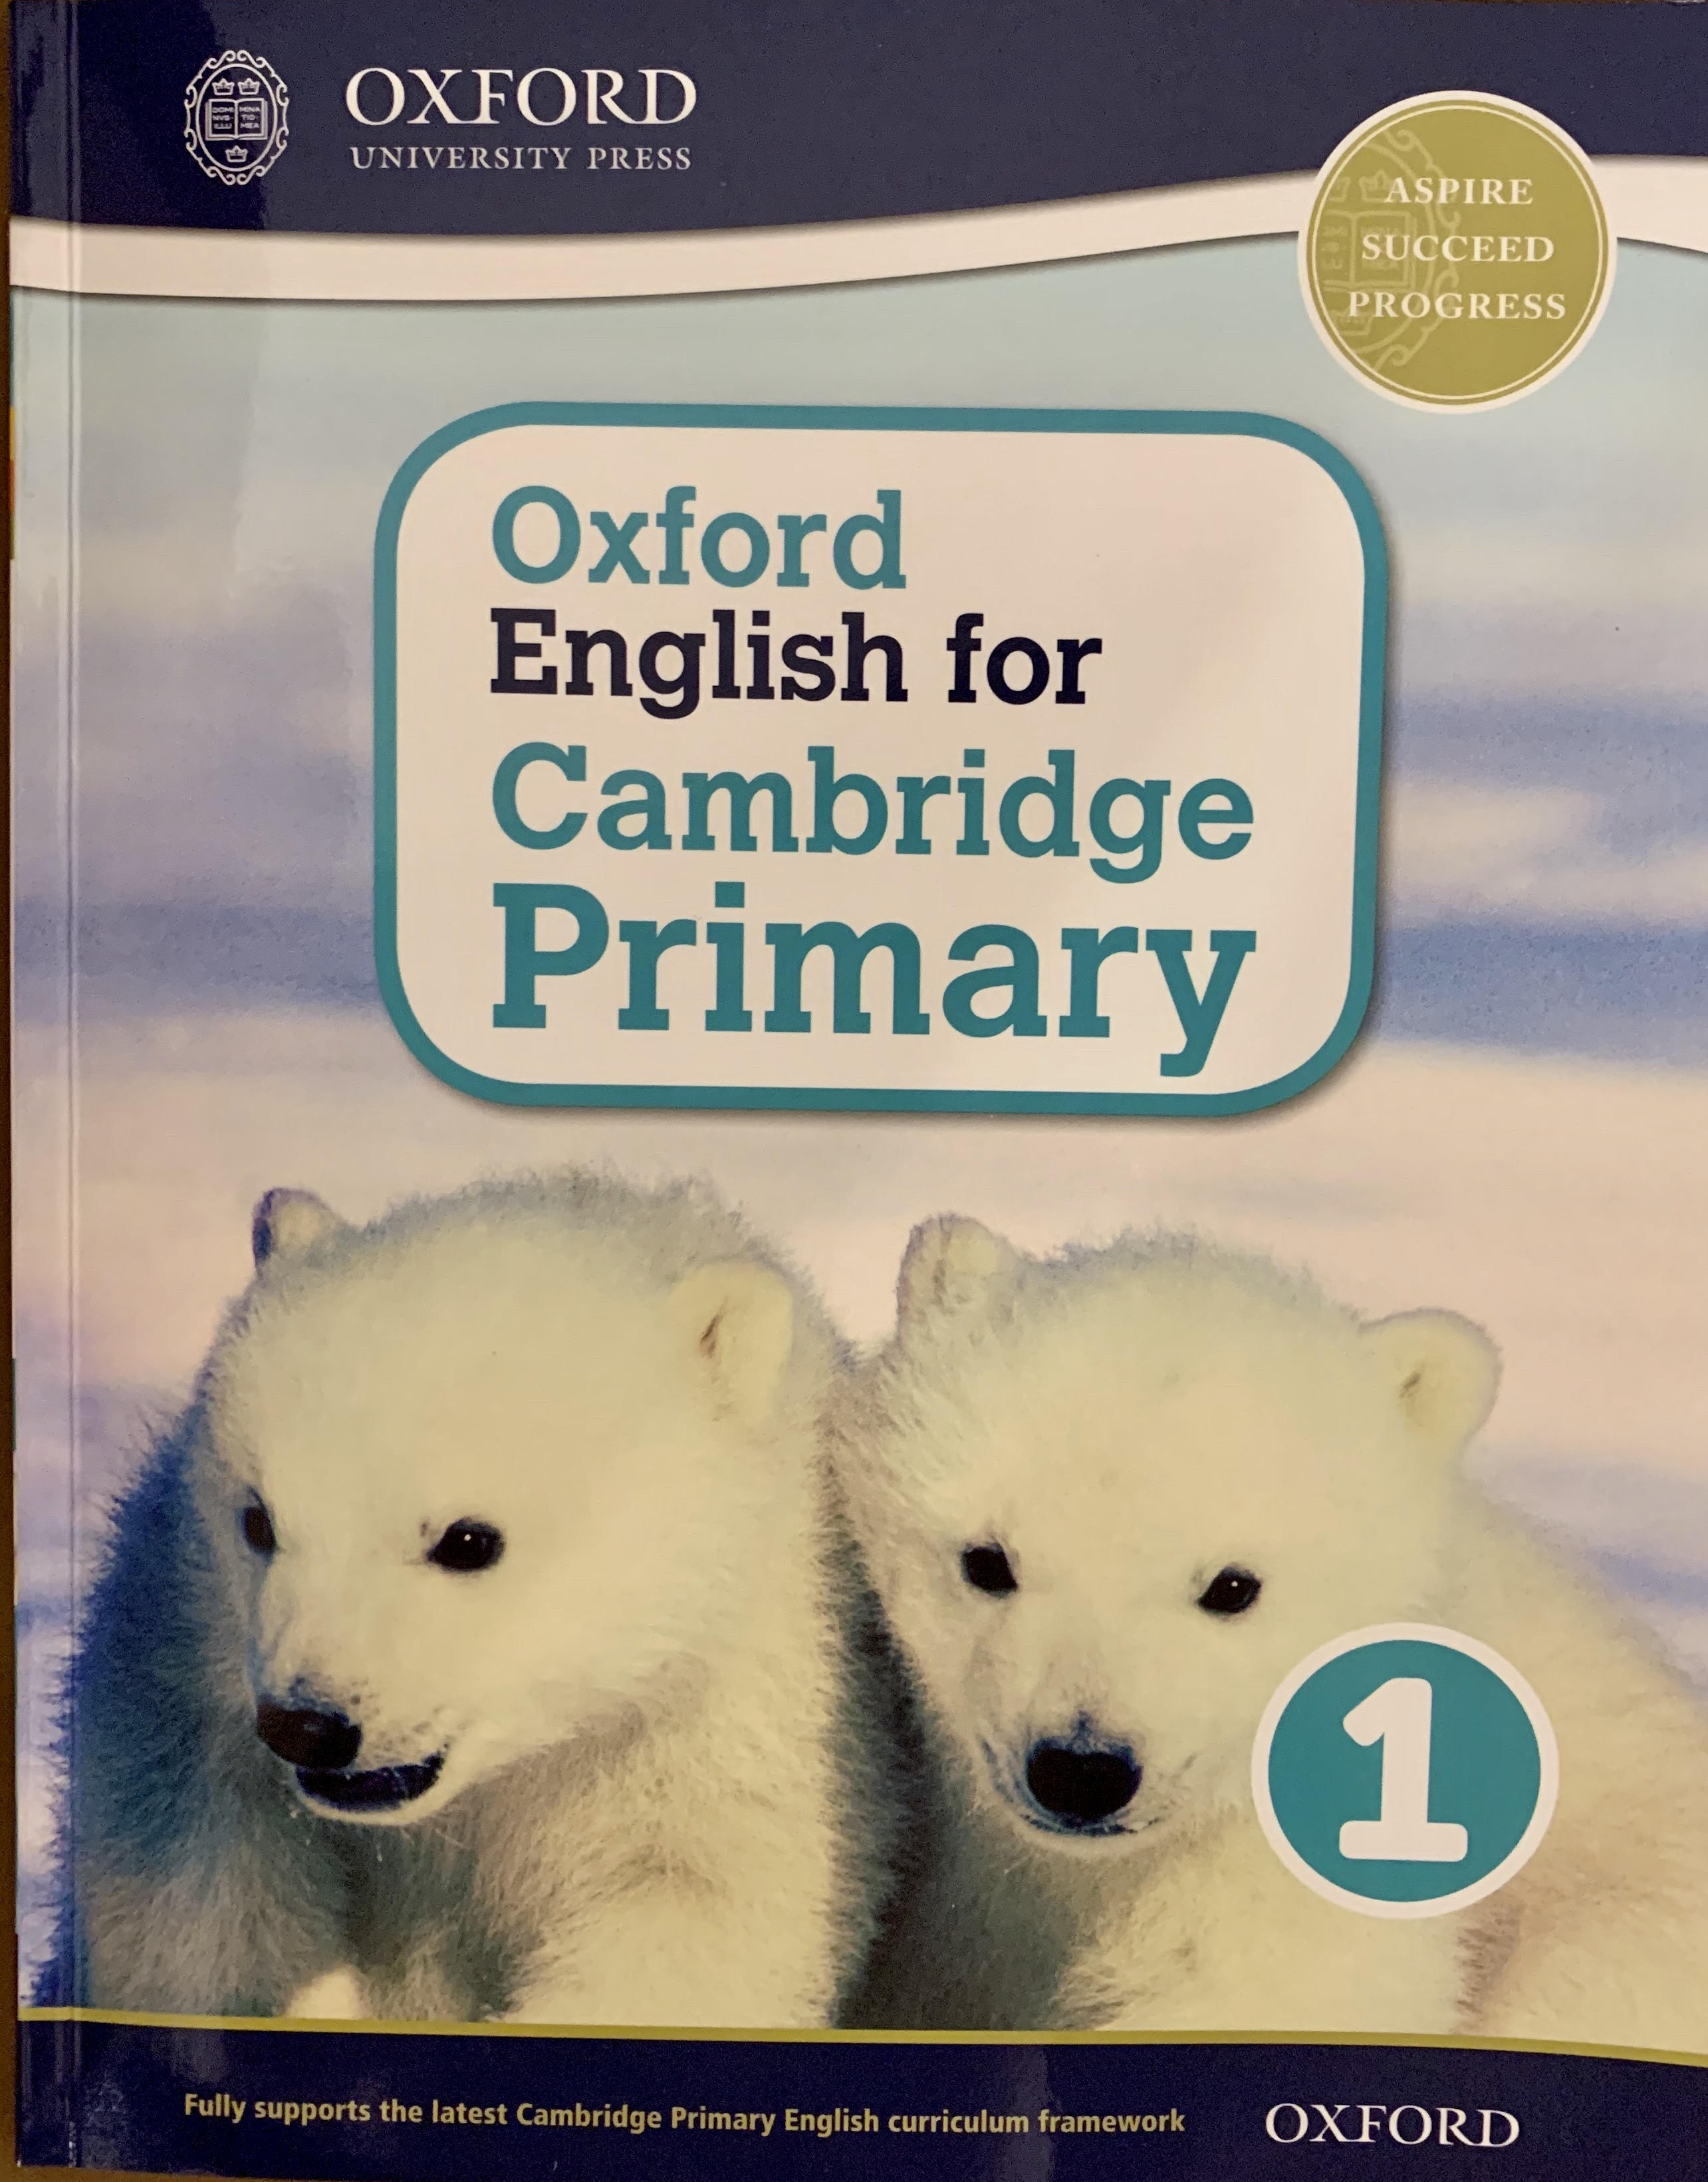 Oxford English for Cambridge Primary 1